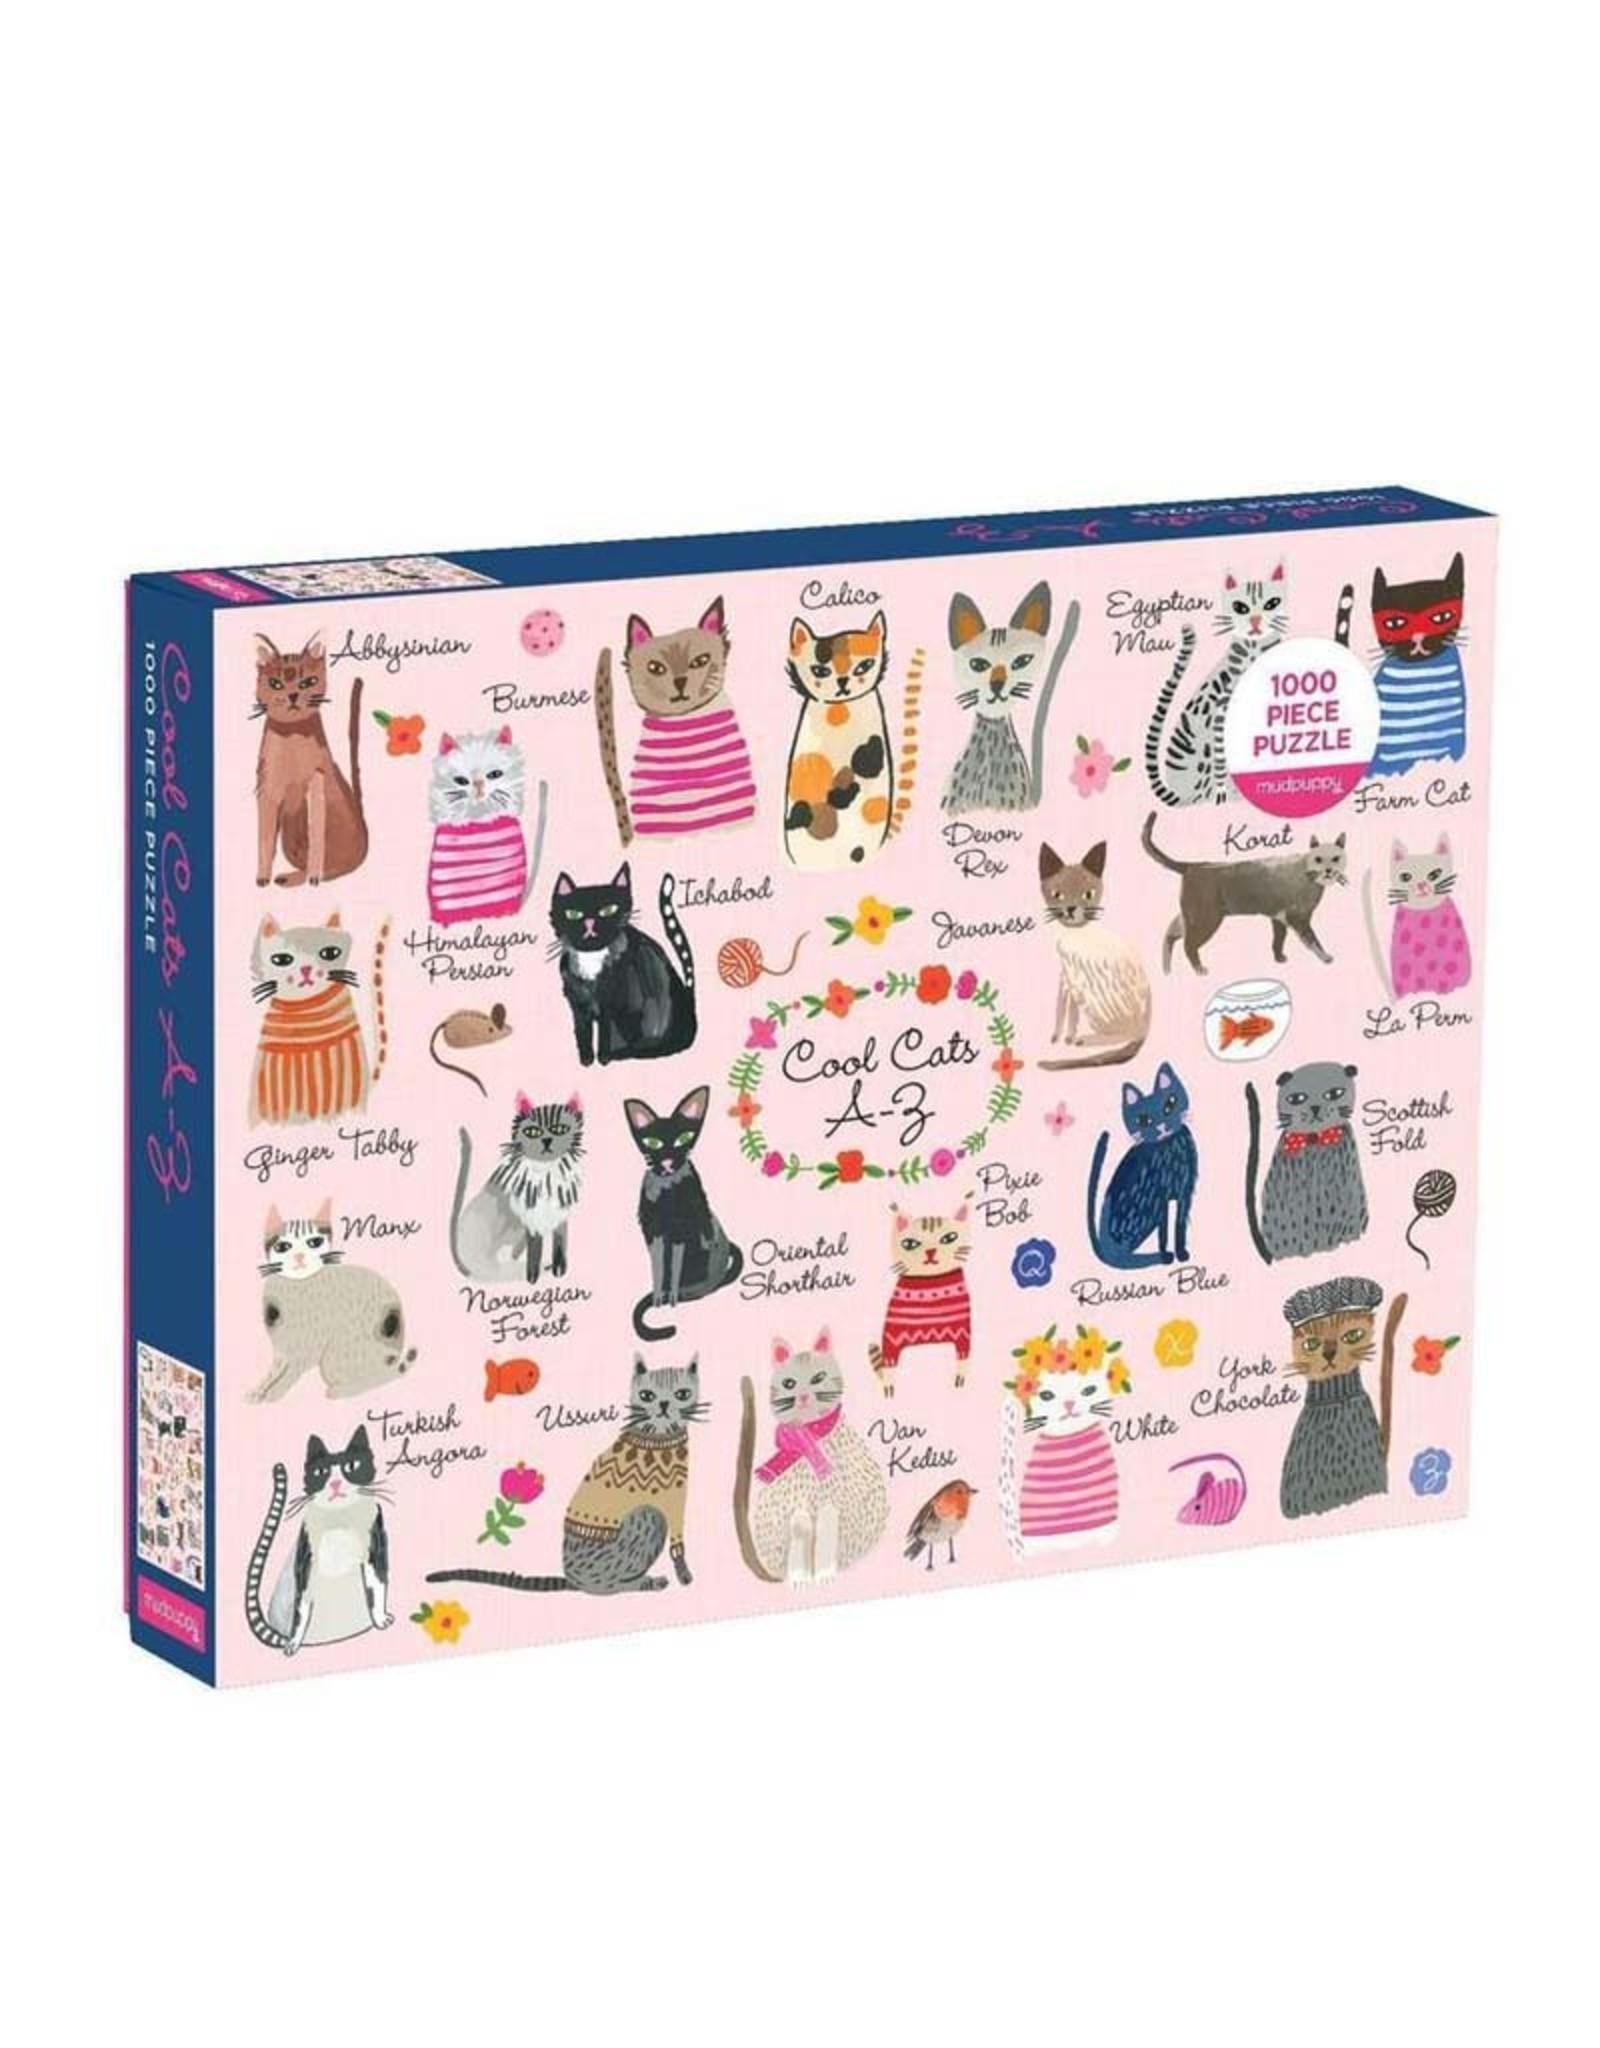 Galison 1000pc Puzzle Cool Cats A-Z